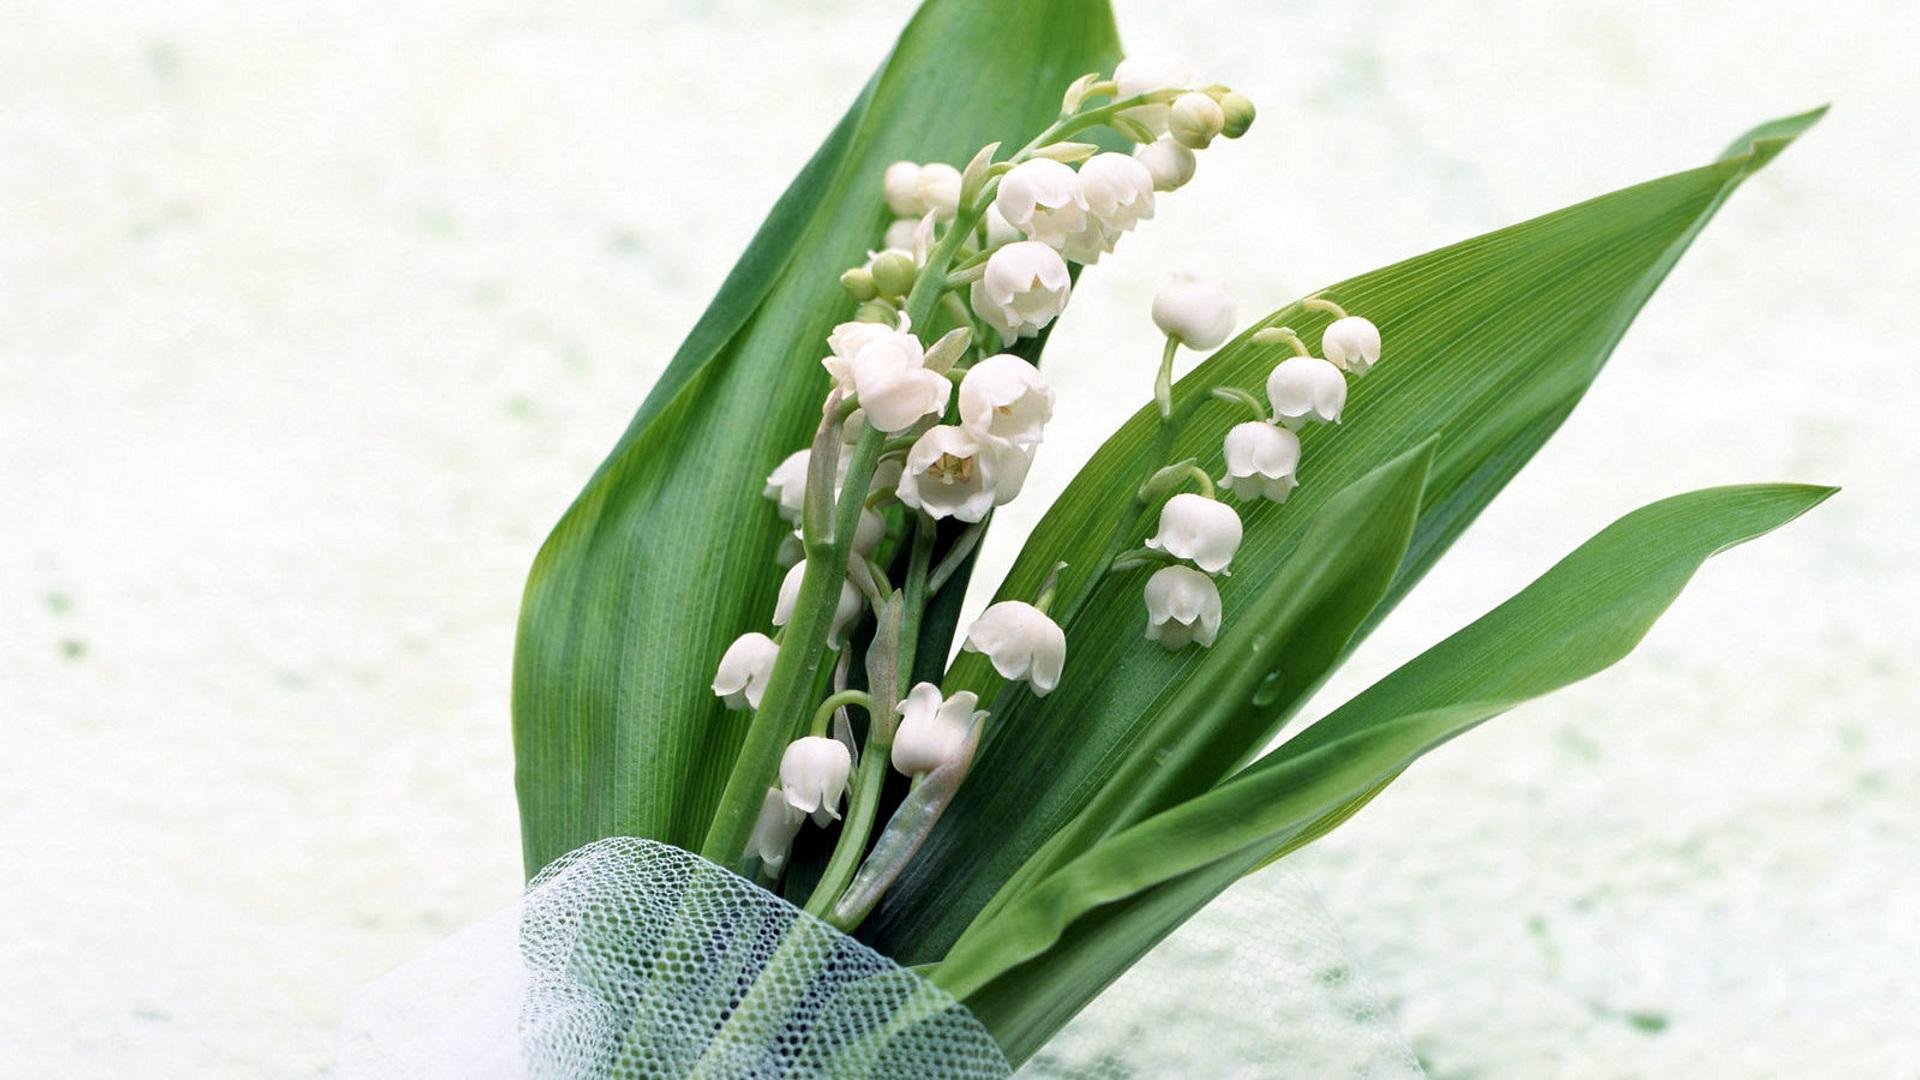 картинка цветы ландыши нарциссы лилии какими